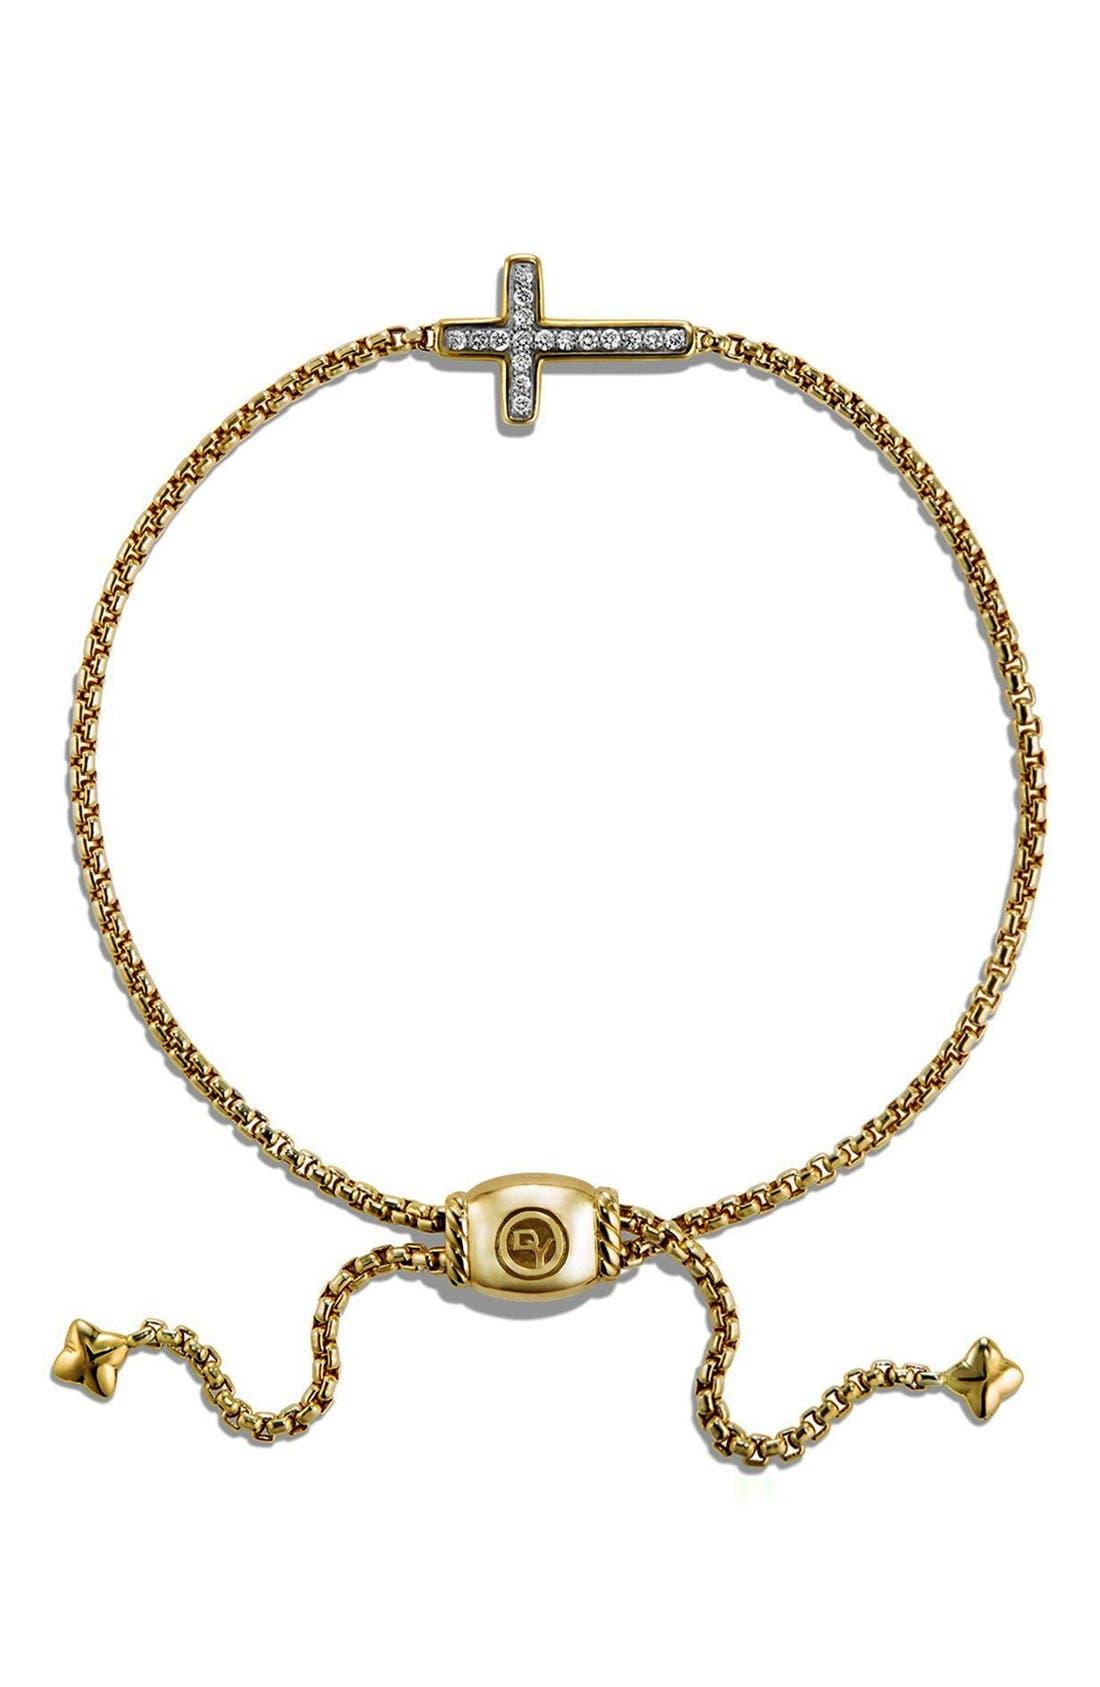 'Petite Pavé' Cross Bracelet with Diamonds in 18K Gold,                             Alternate thumbnail 2, color,                             GOLD